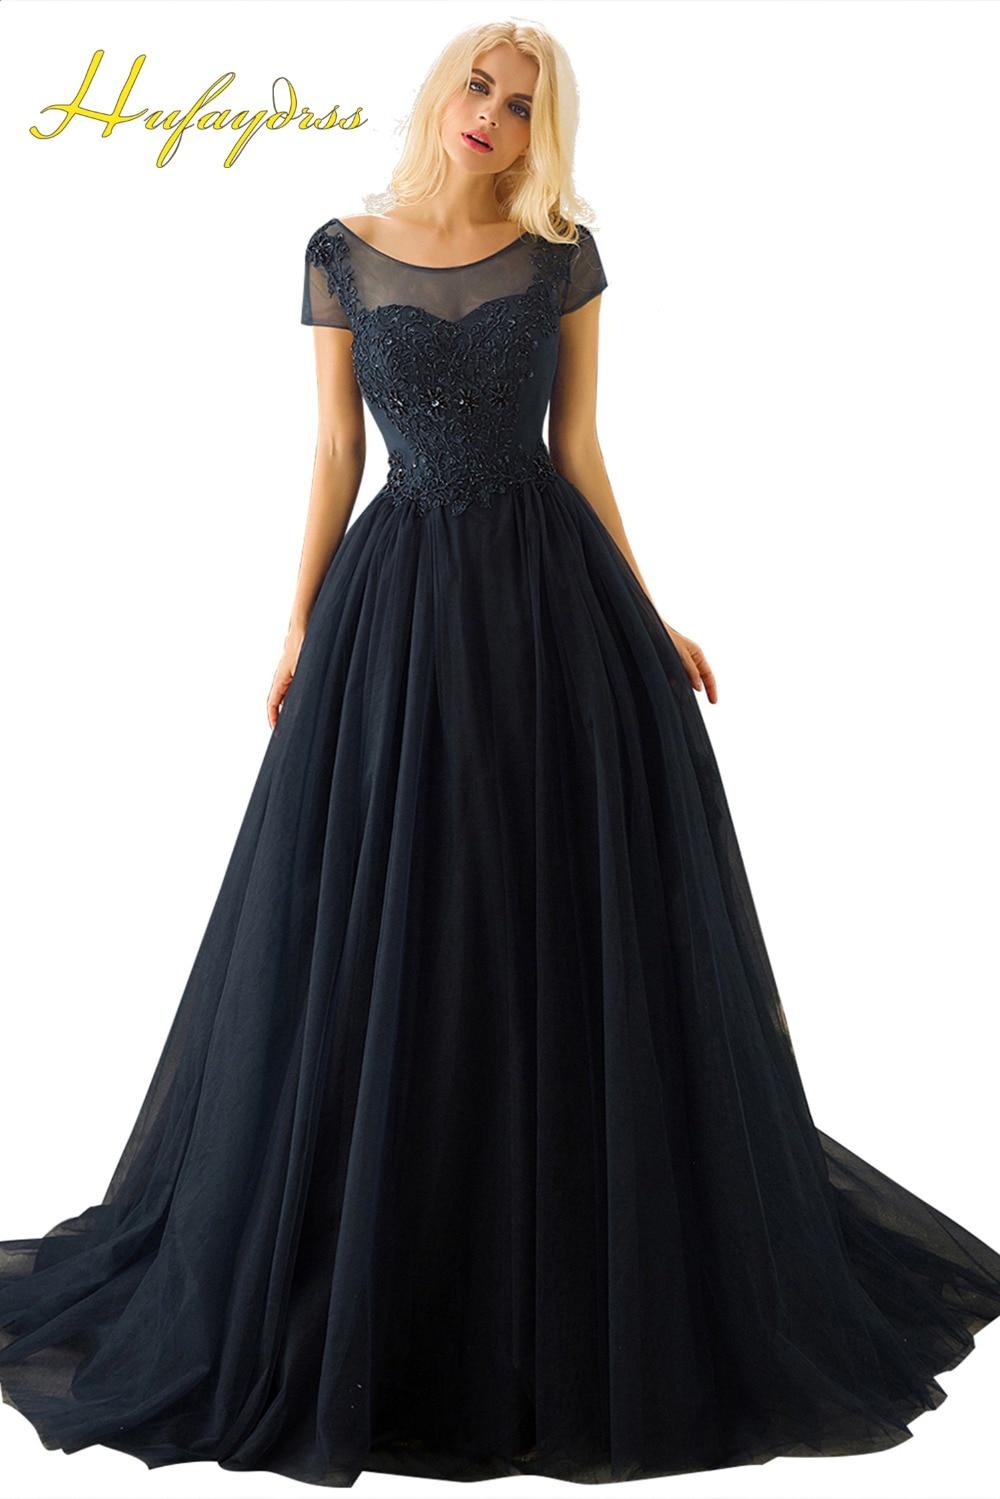 London formal dress shops choice image dresses design ideas 100 lace evening dress size 25 size dresses ideas curvy popular plus size blue ball gown ombrellifo Choice Image